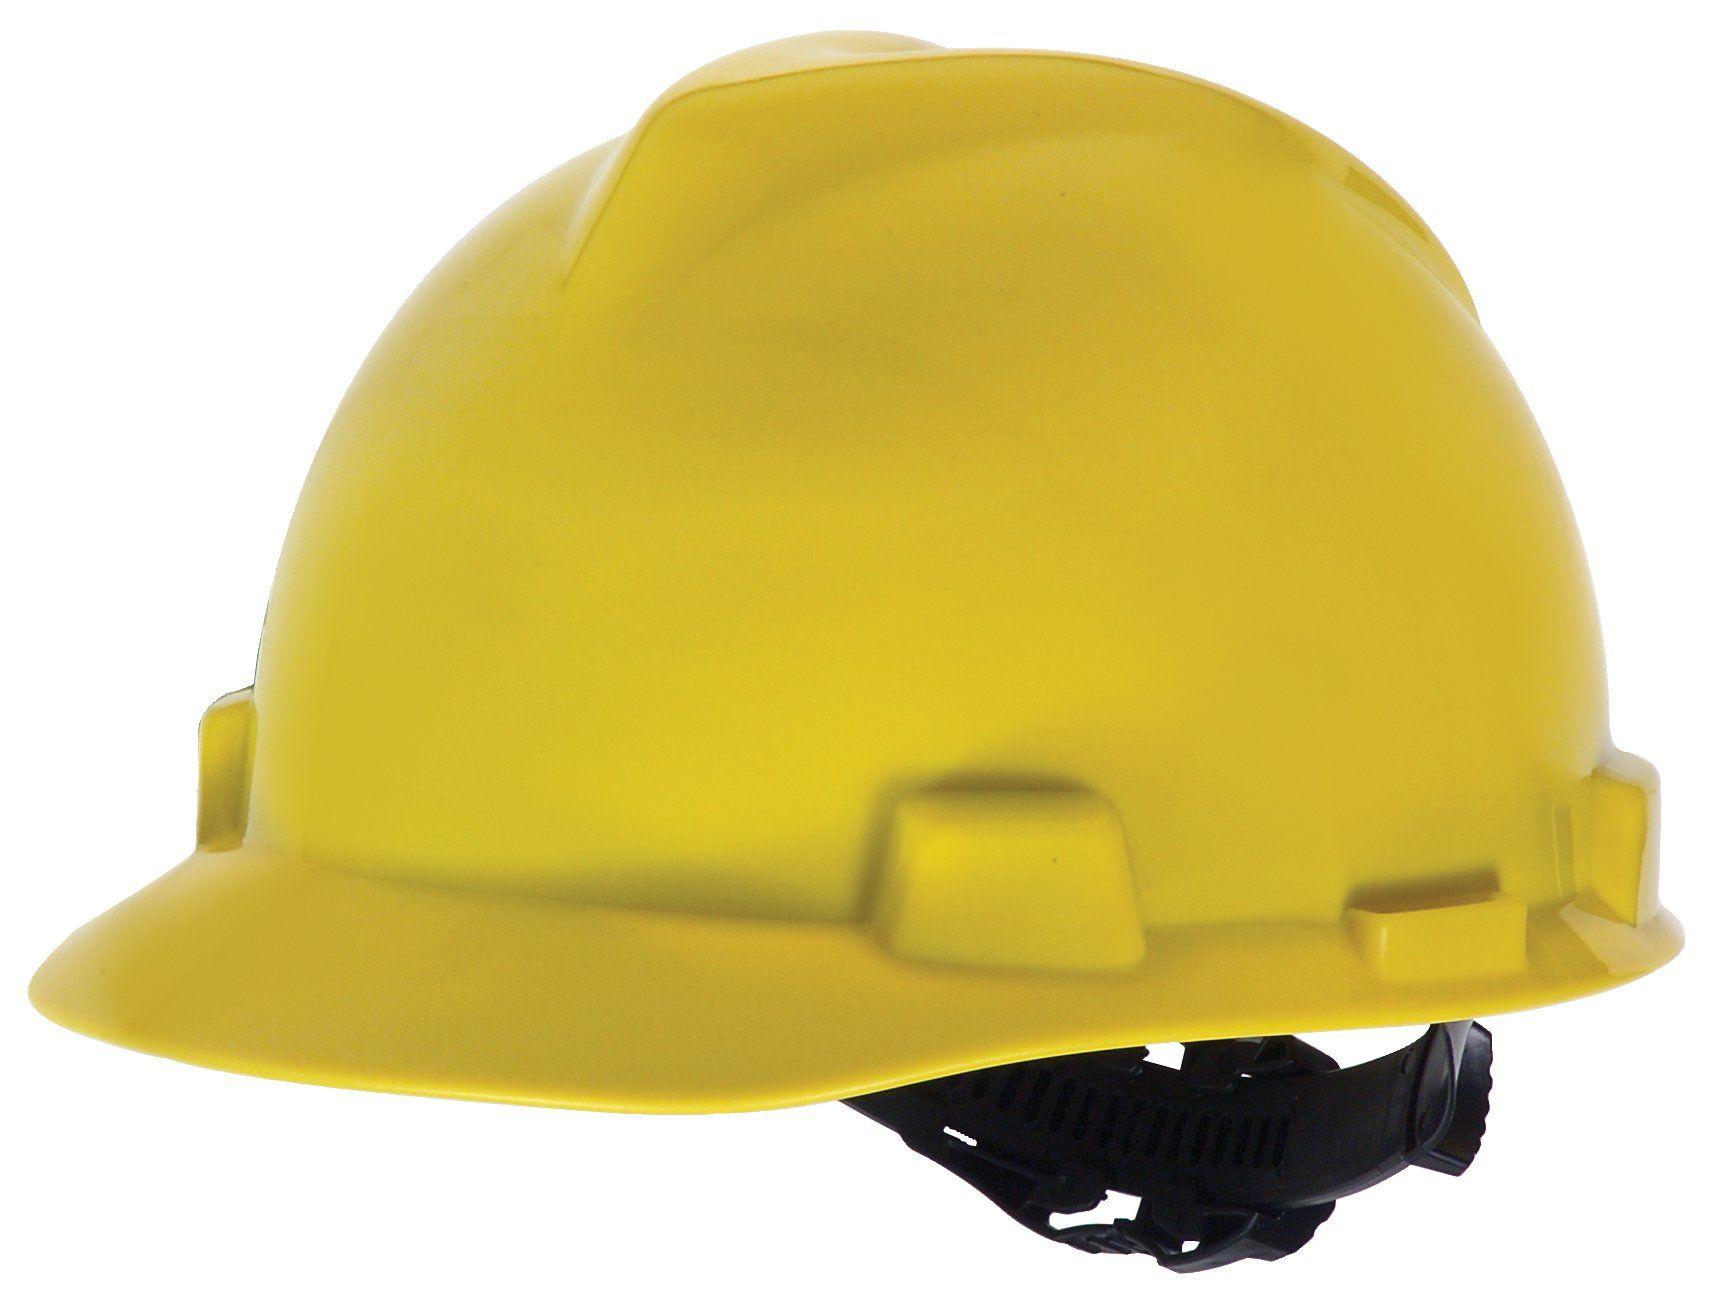 MSA Safety Works 818068 Hard Hat, Yellow Hard hats